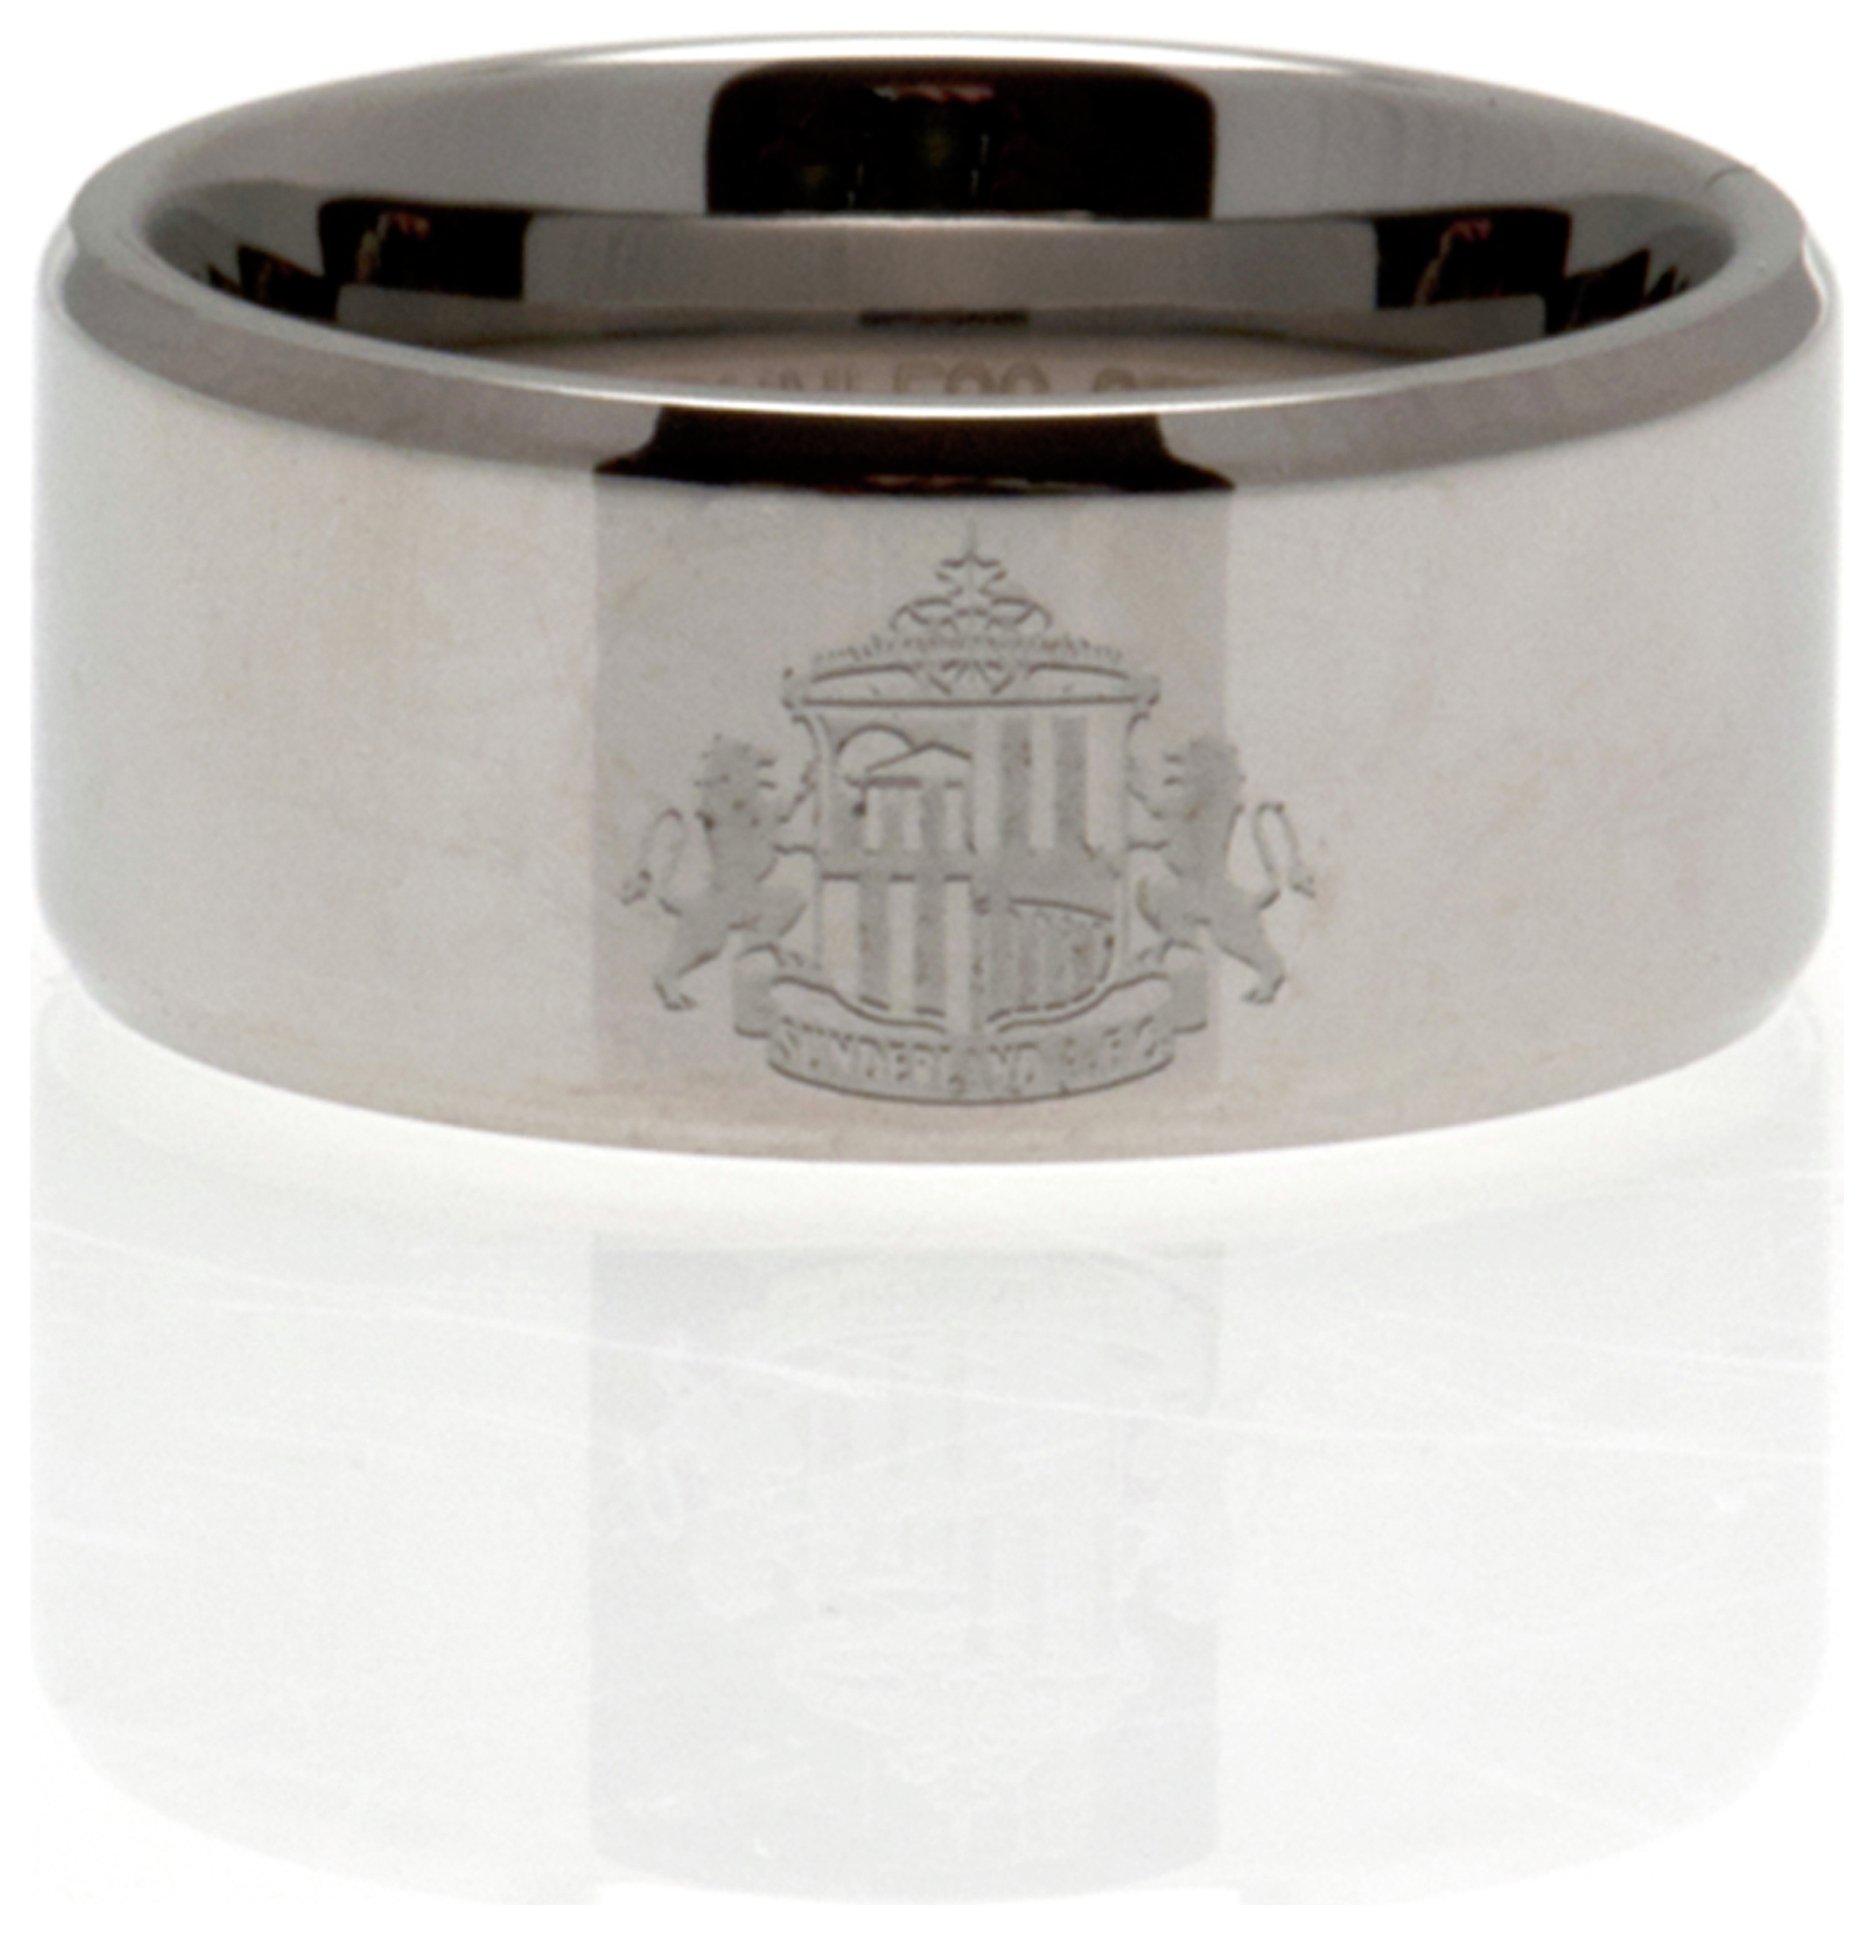 stainless-steel-sunderland-ring-size-u